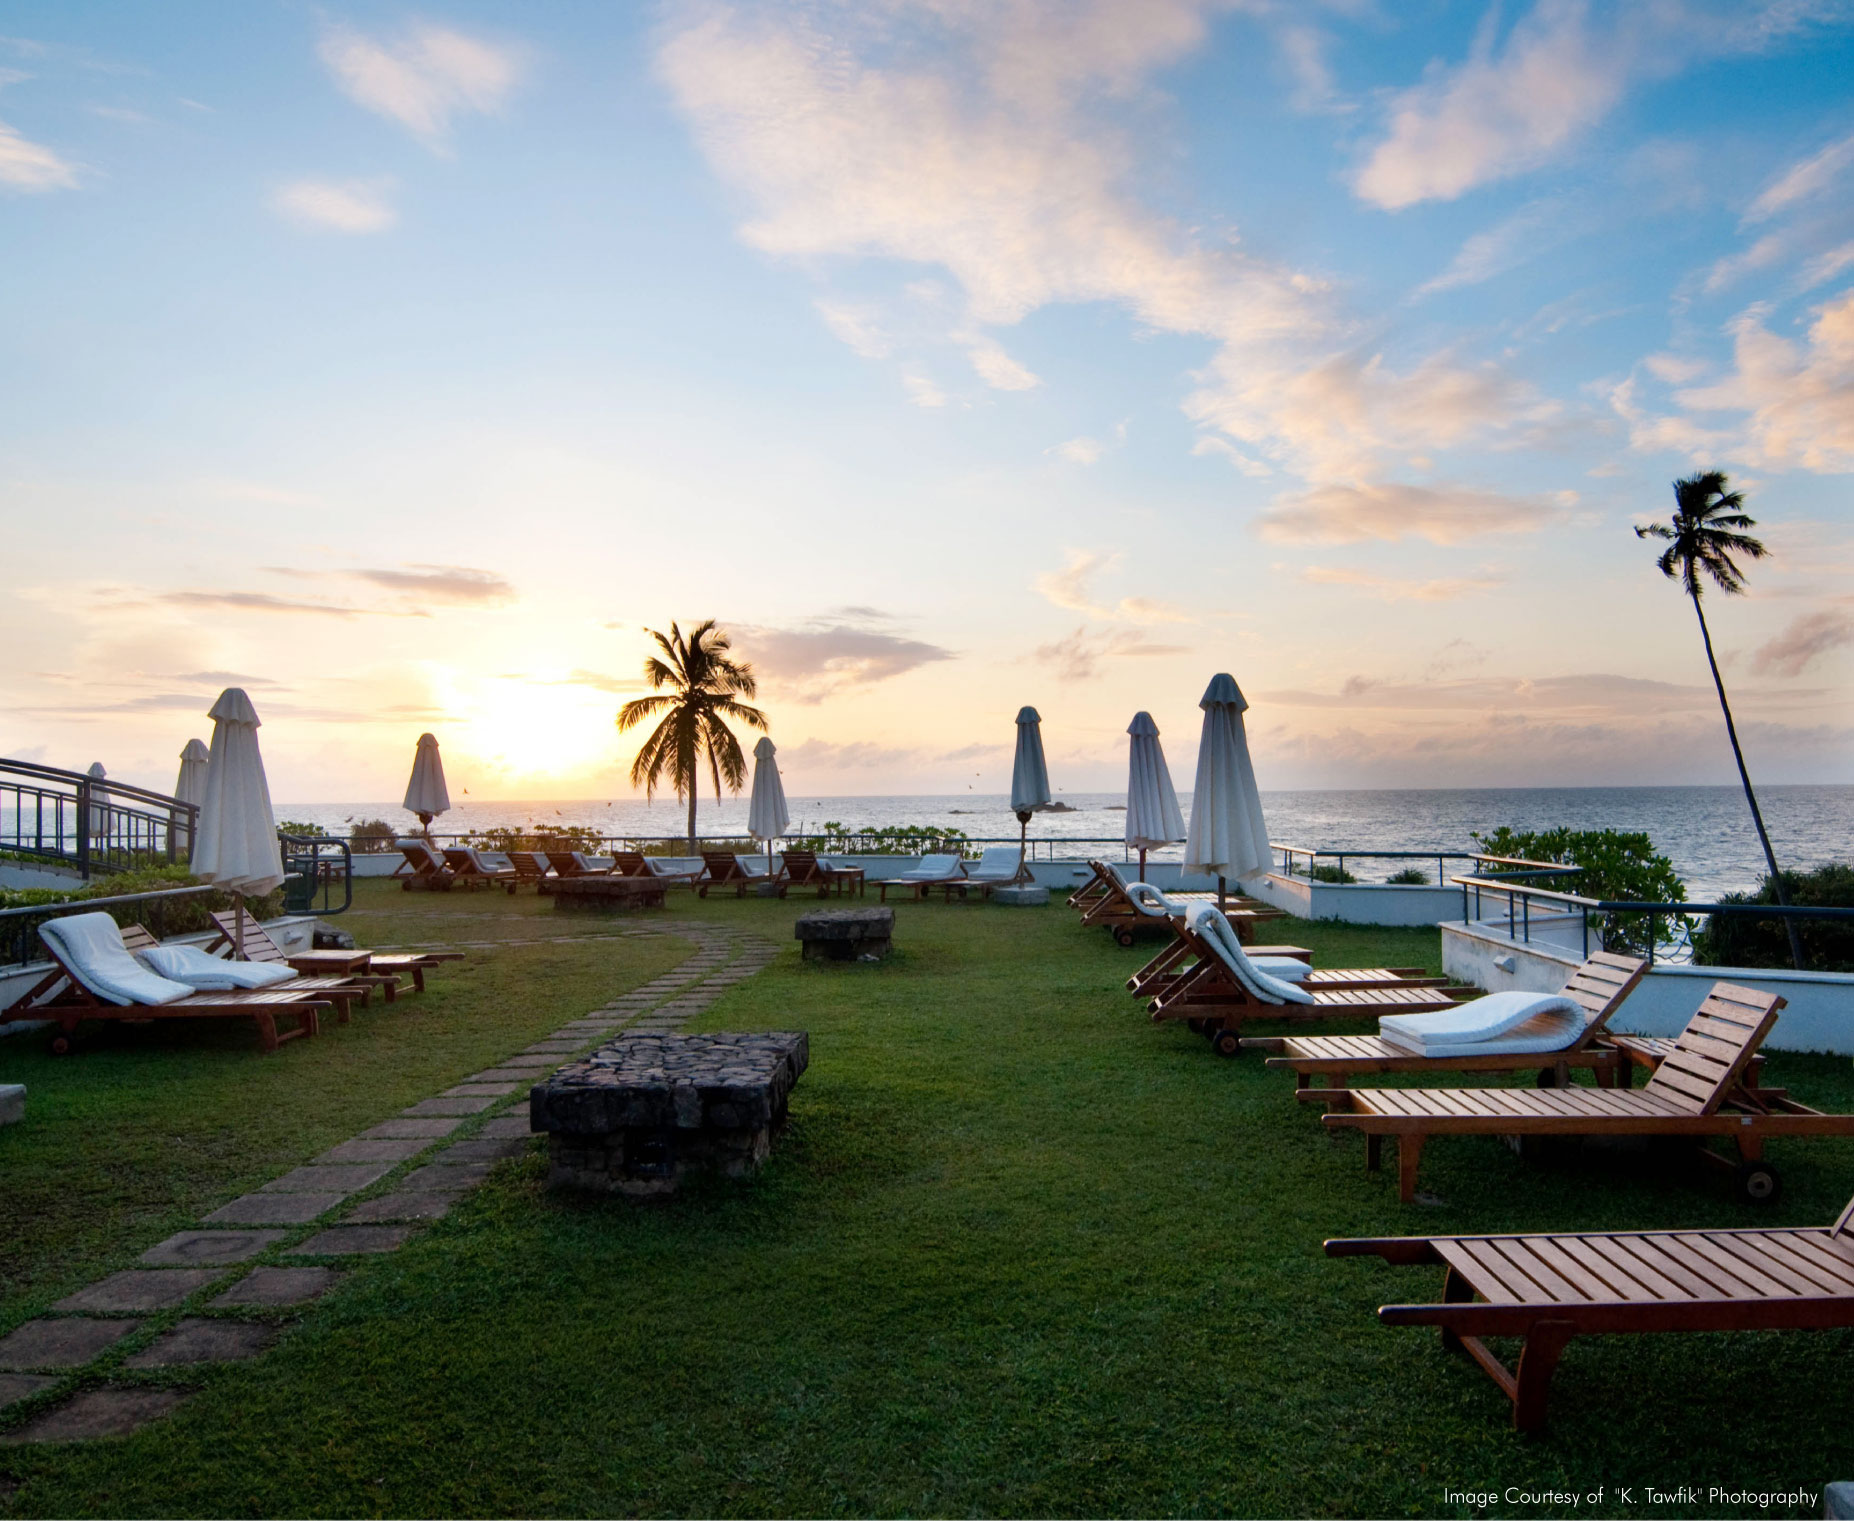 Rezised Bentota- Taj Exotica Resort Terrace-01-01-01.jpg